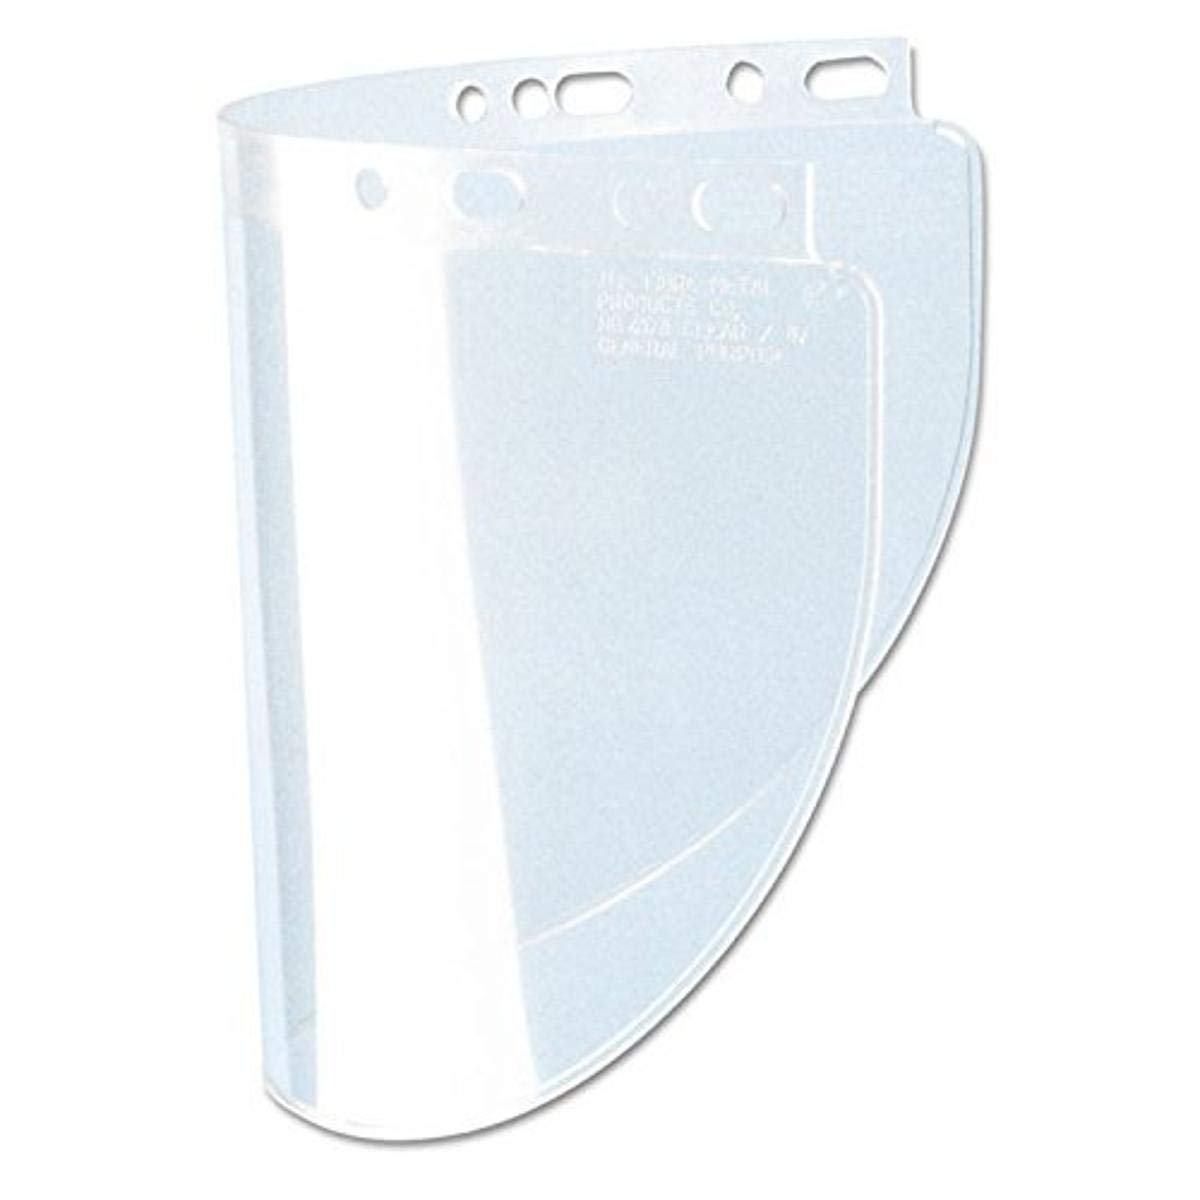 "Honeywell Fibre-Metal 4118CL High Performance Faceshield Windows, Clear, Standard, 8"" x 11 1/4"""